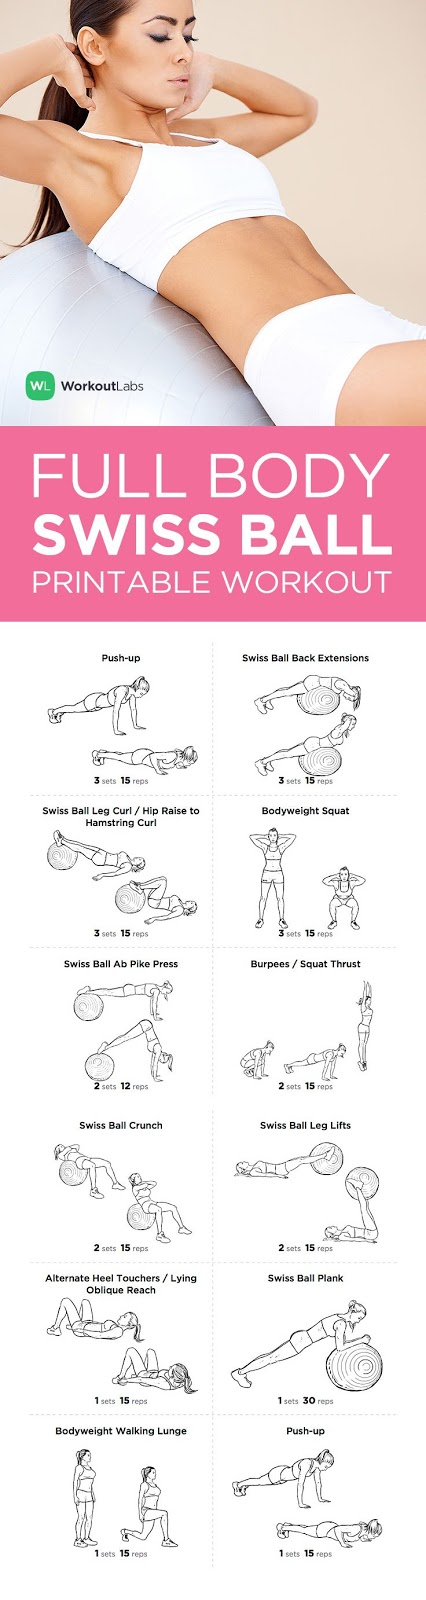 Full Body Swiss Ball Workout